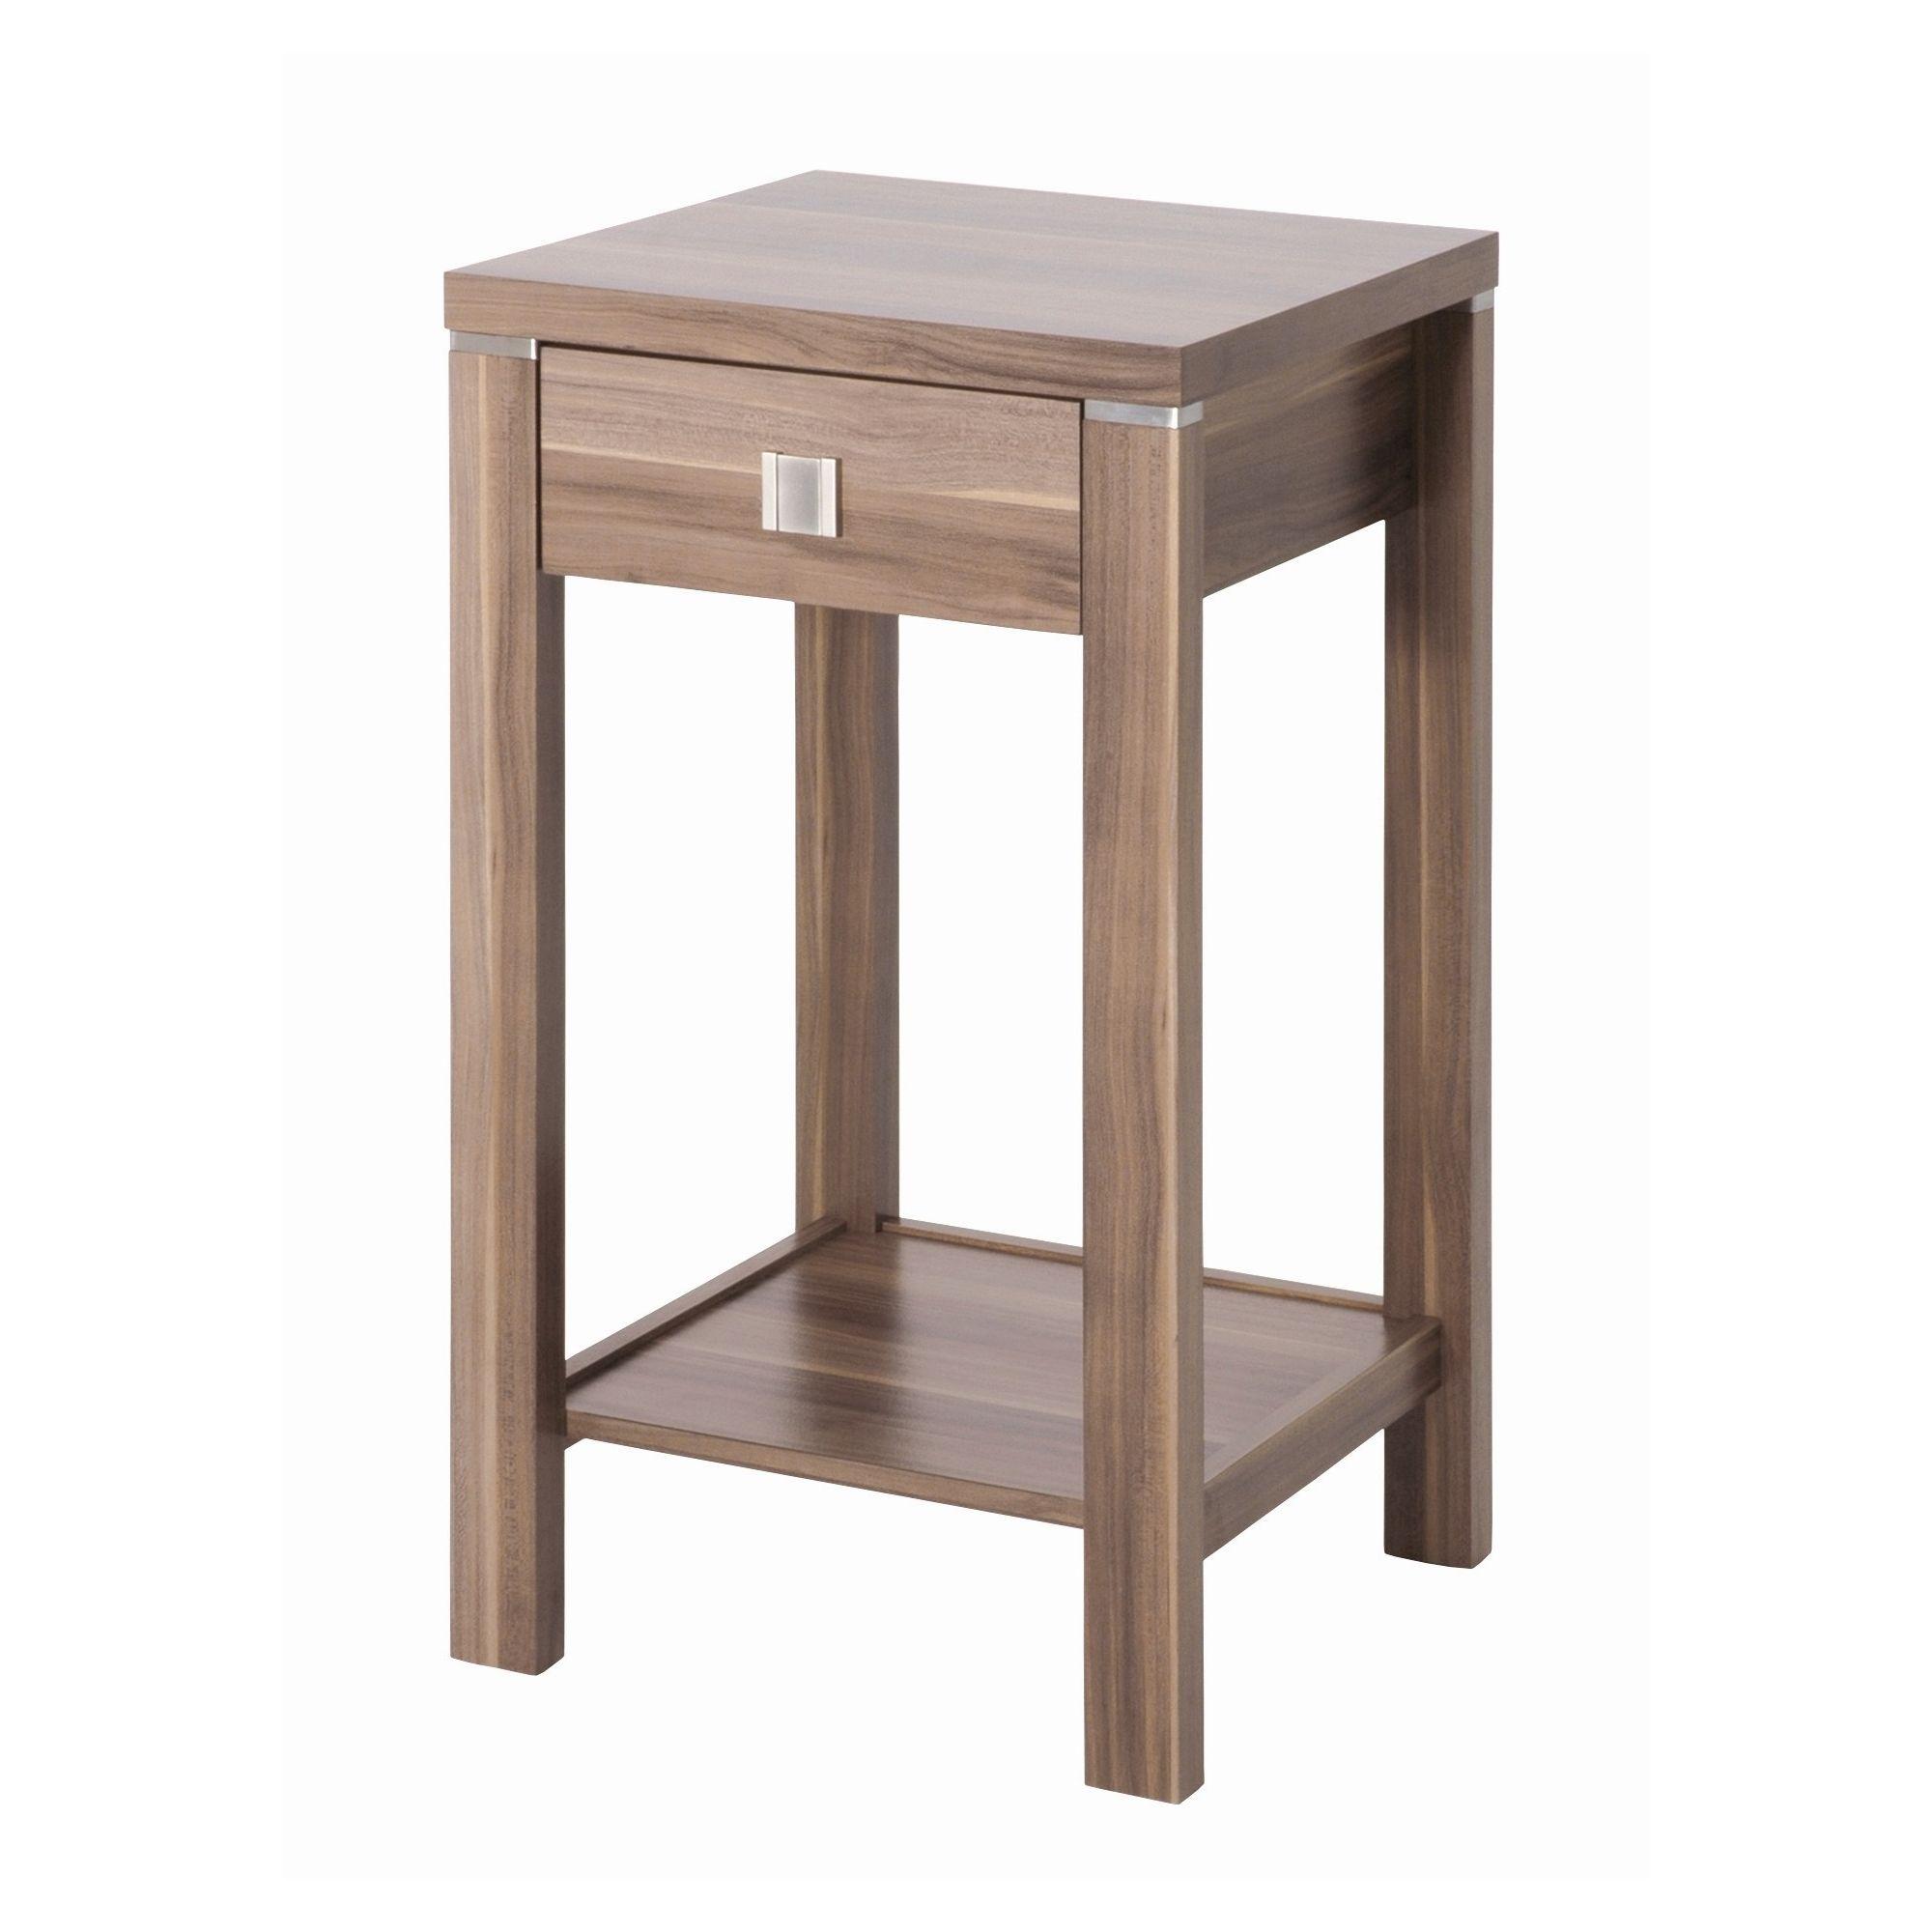 Urbane Designs Samba Nut 74cm Console Table in Walnut